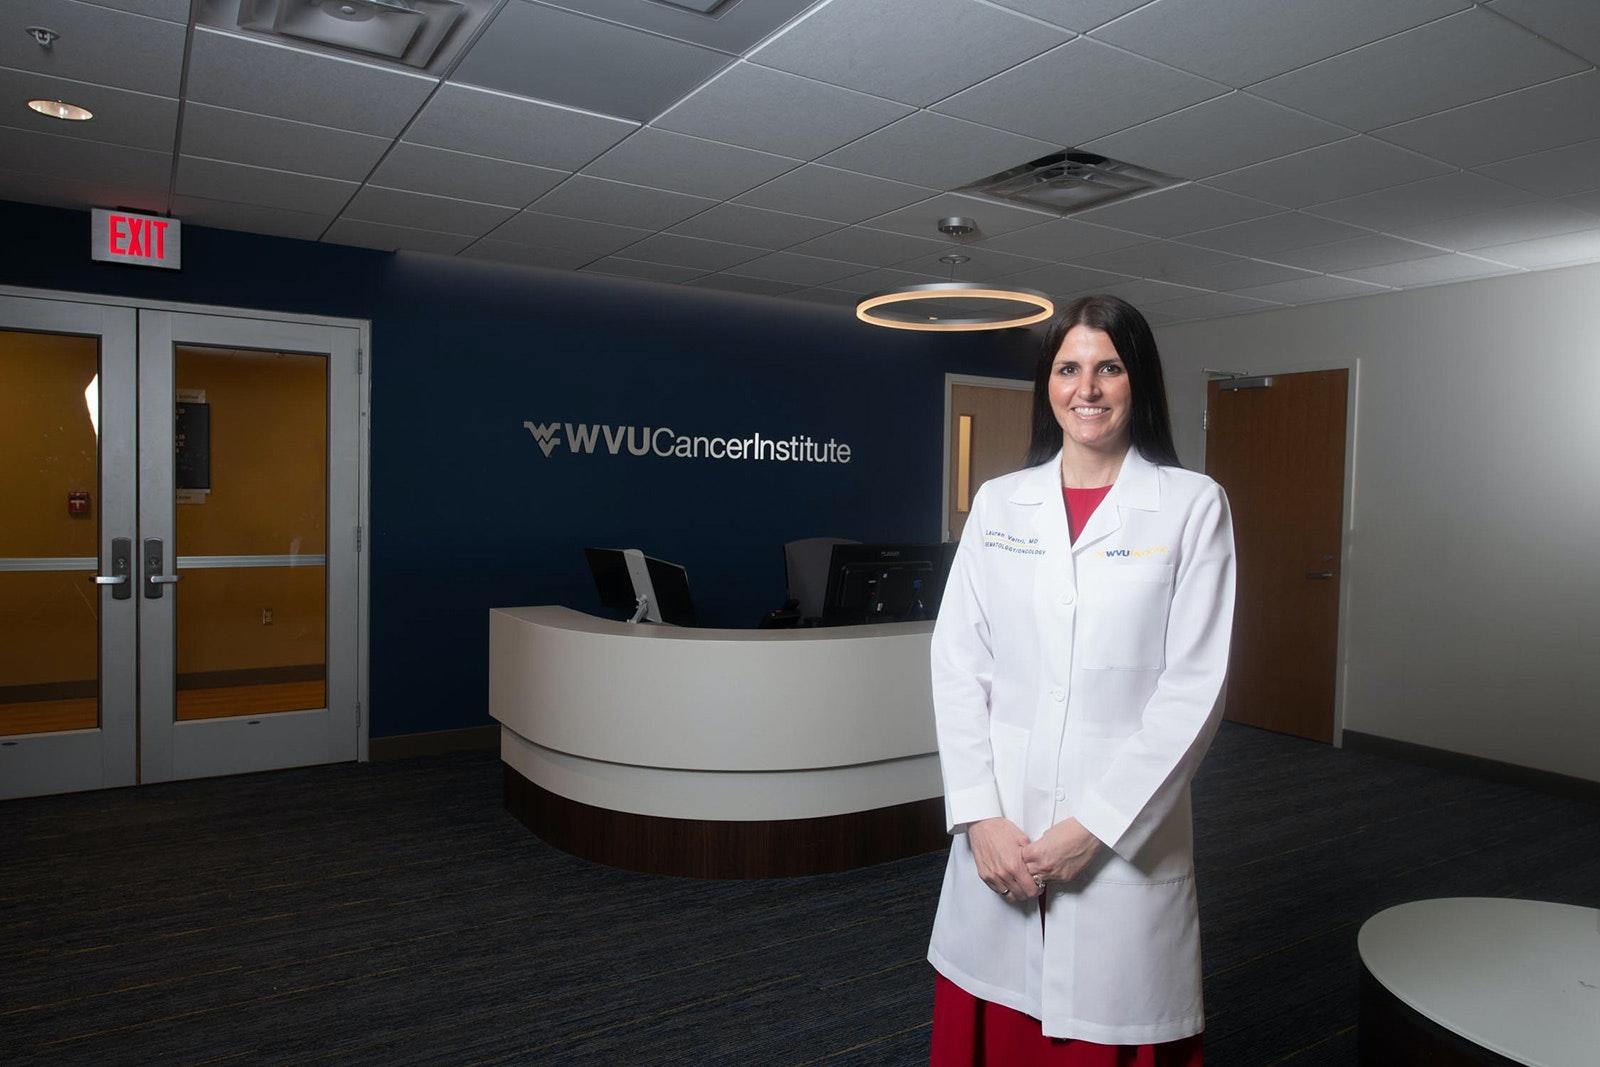 Lauren Veltri, MD's portrait